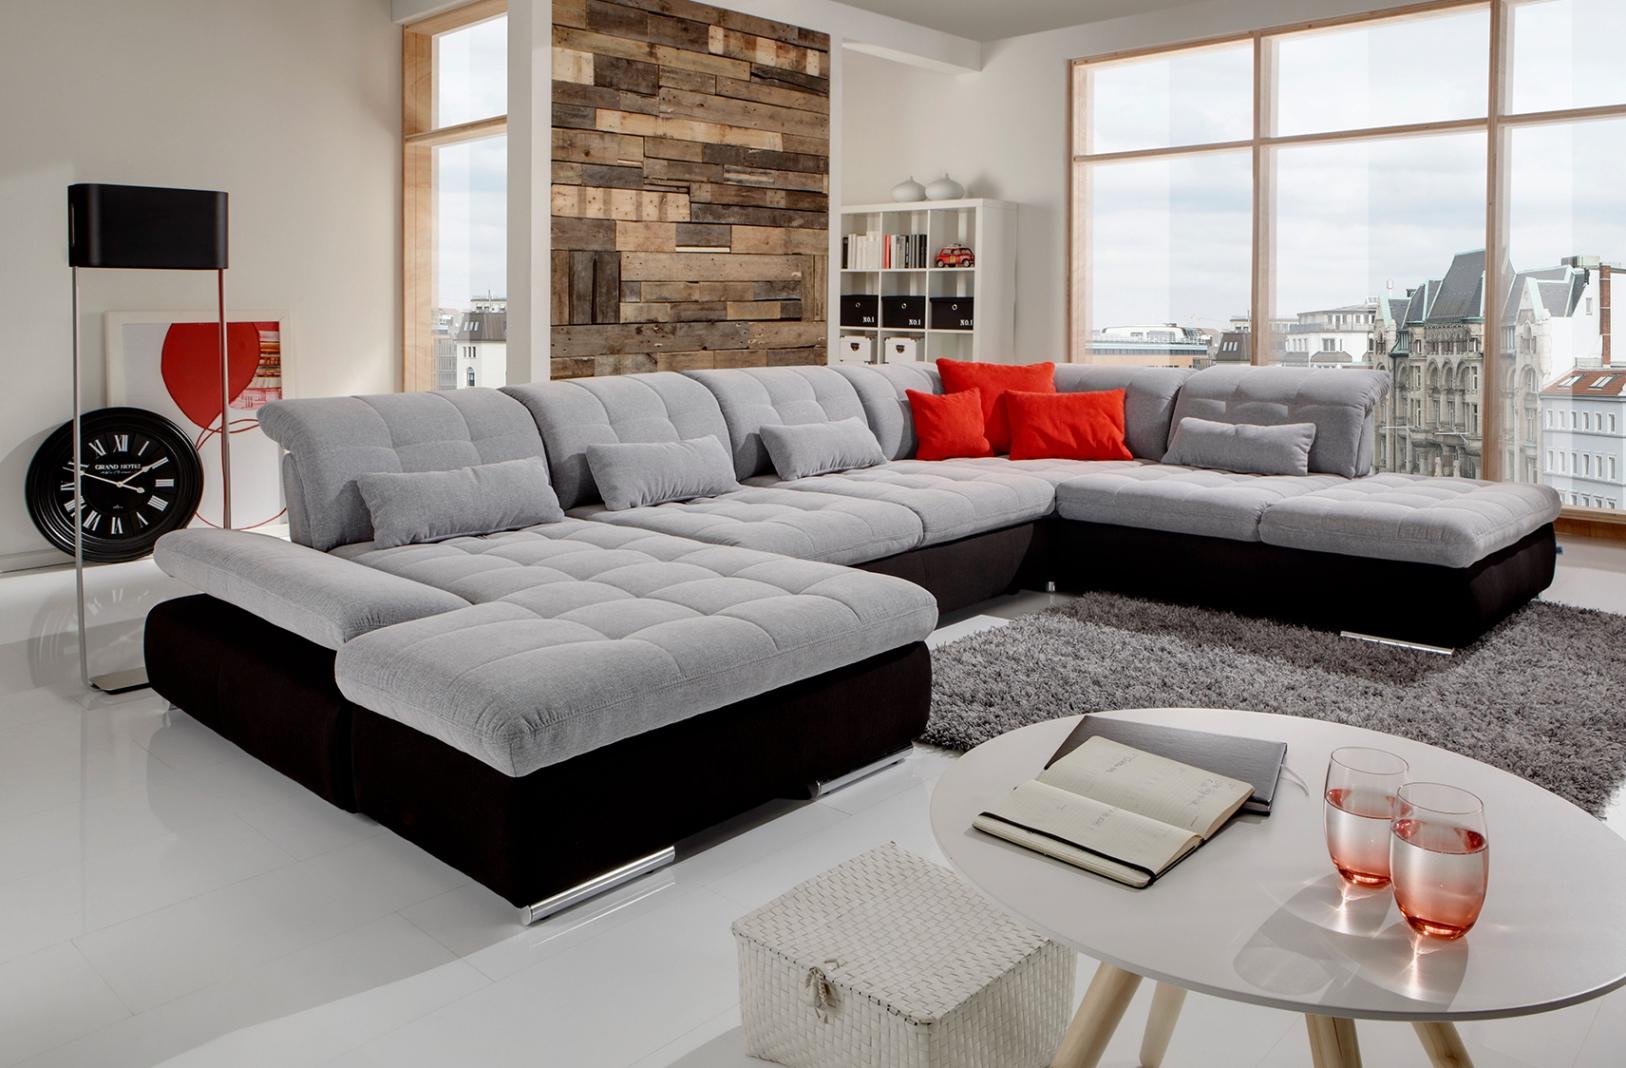 Alpine Sectional Sofa Sleeper With Storage